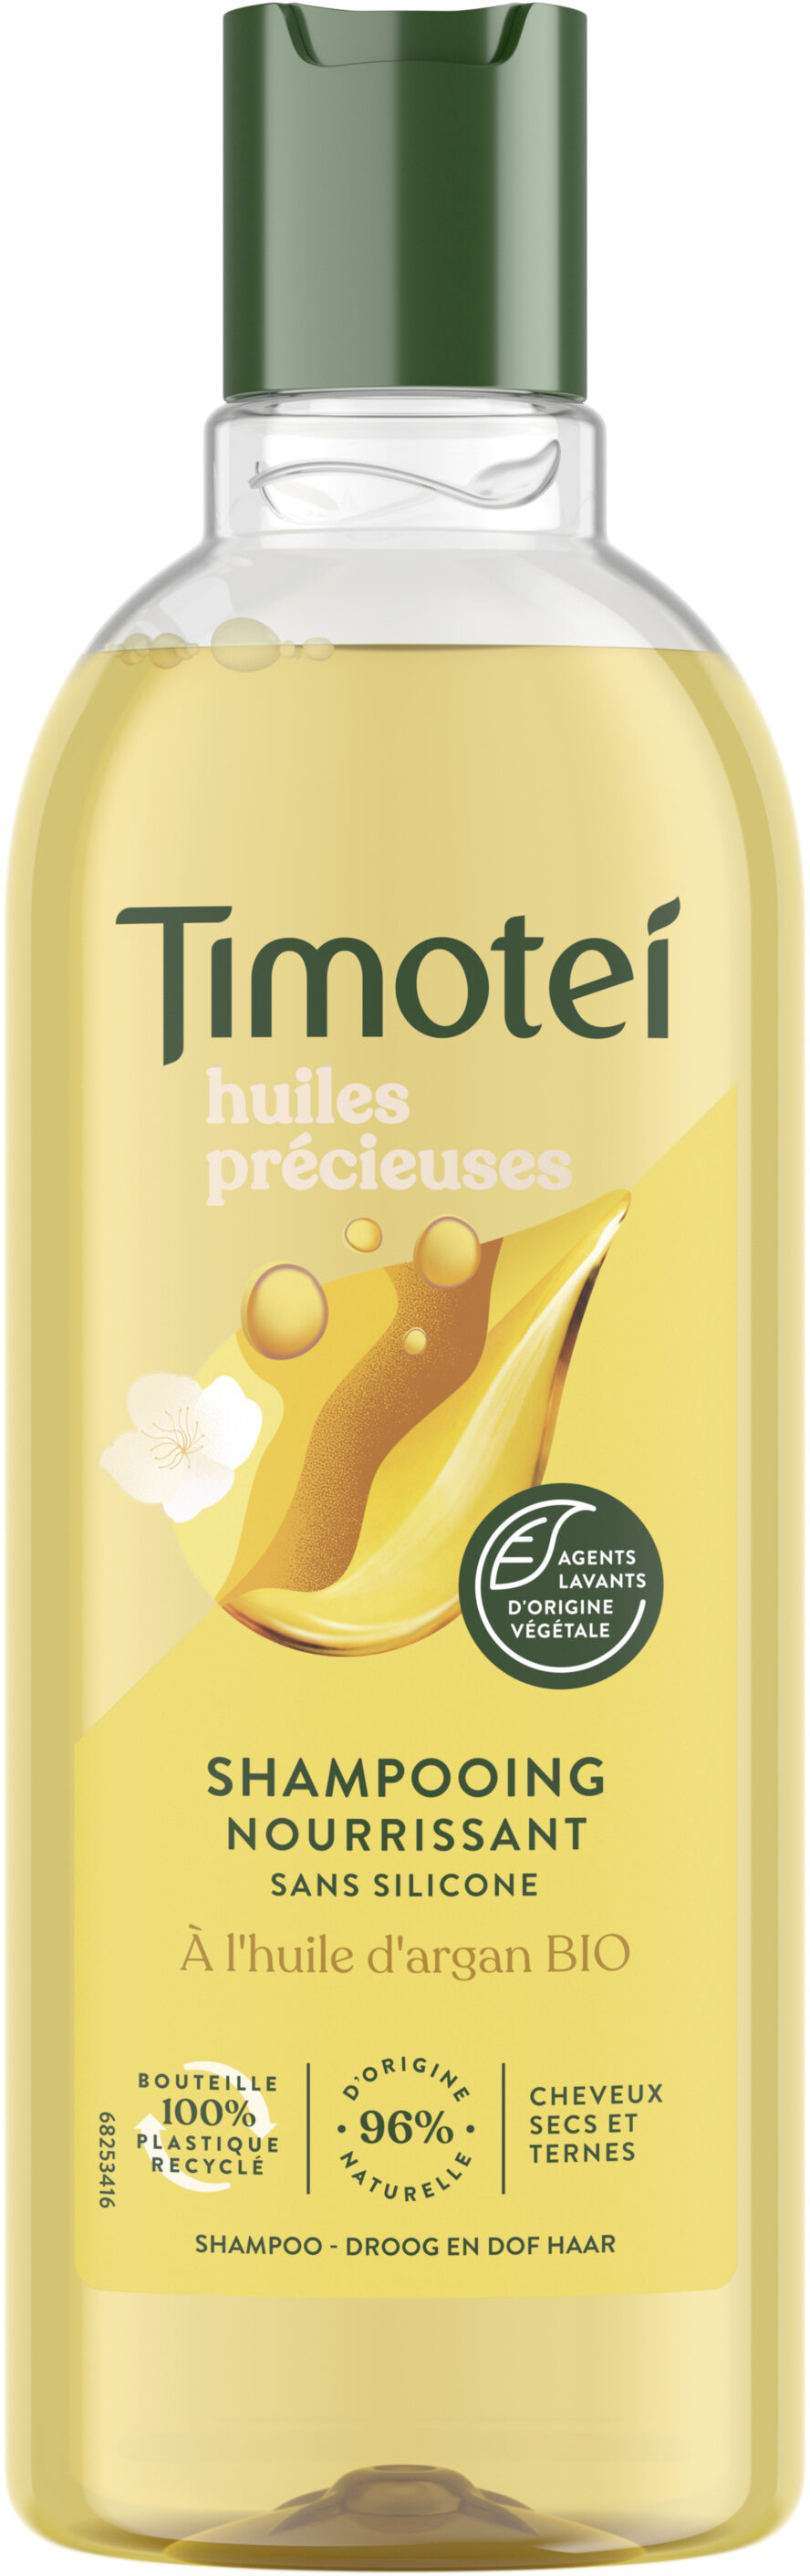 Timotei Shampooing Femme Huiles Précieuses Nourrissant - Product - fr